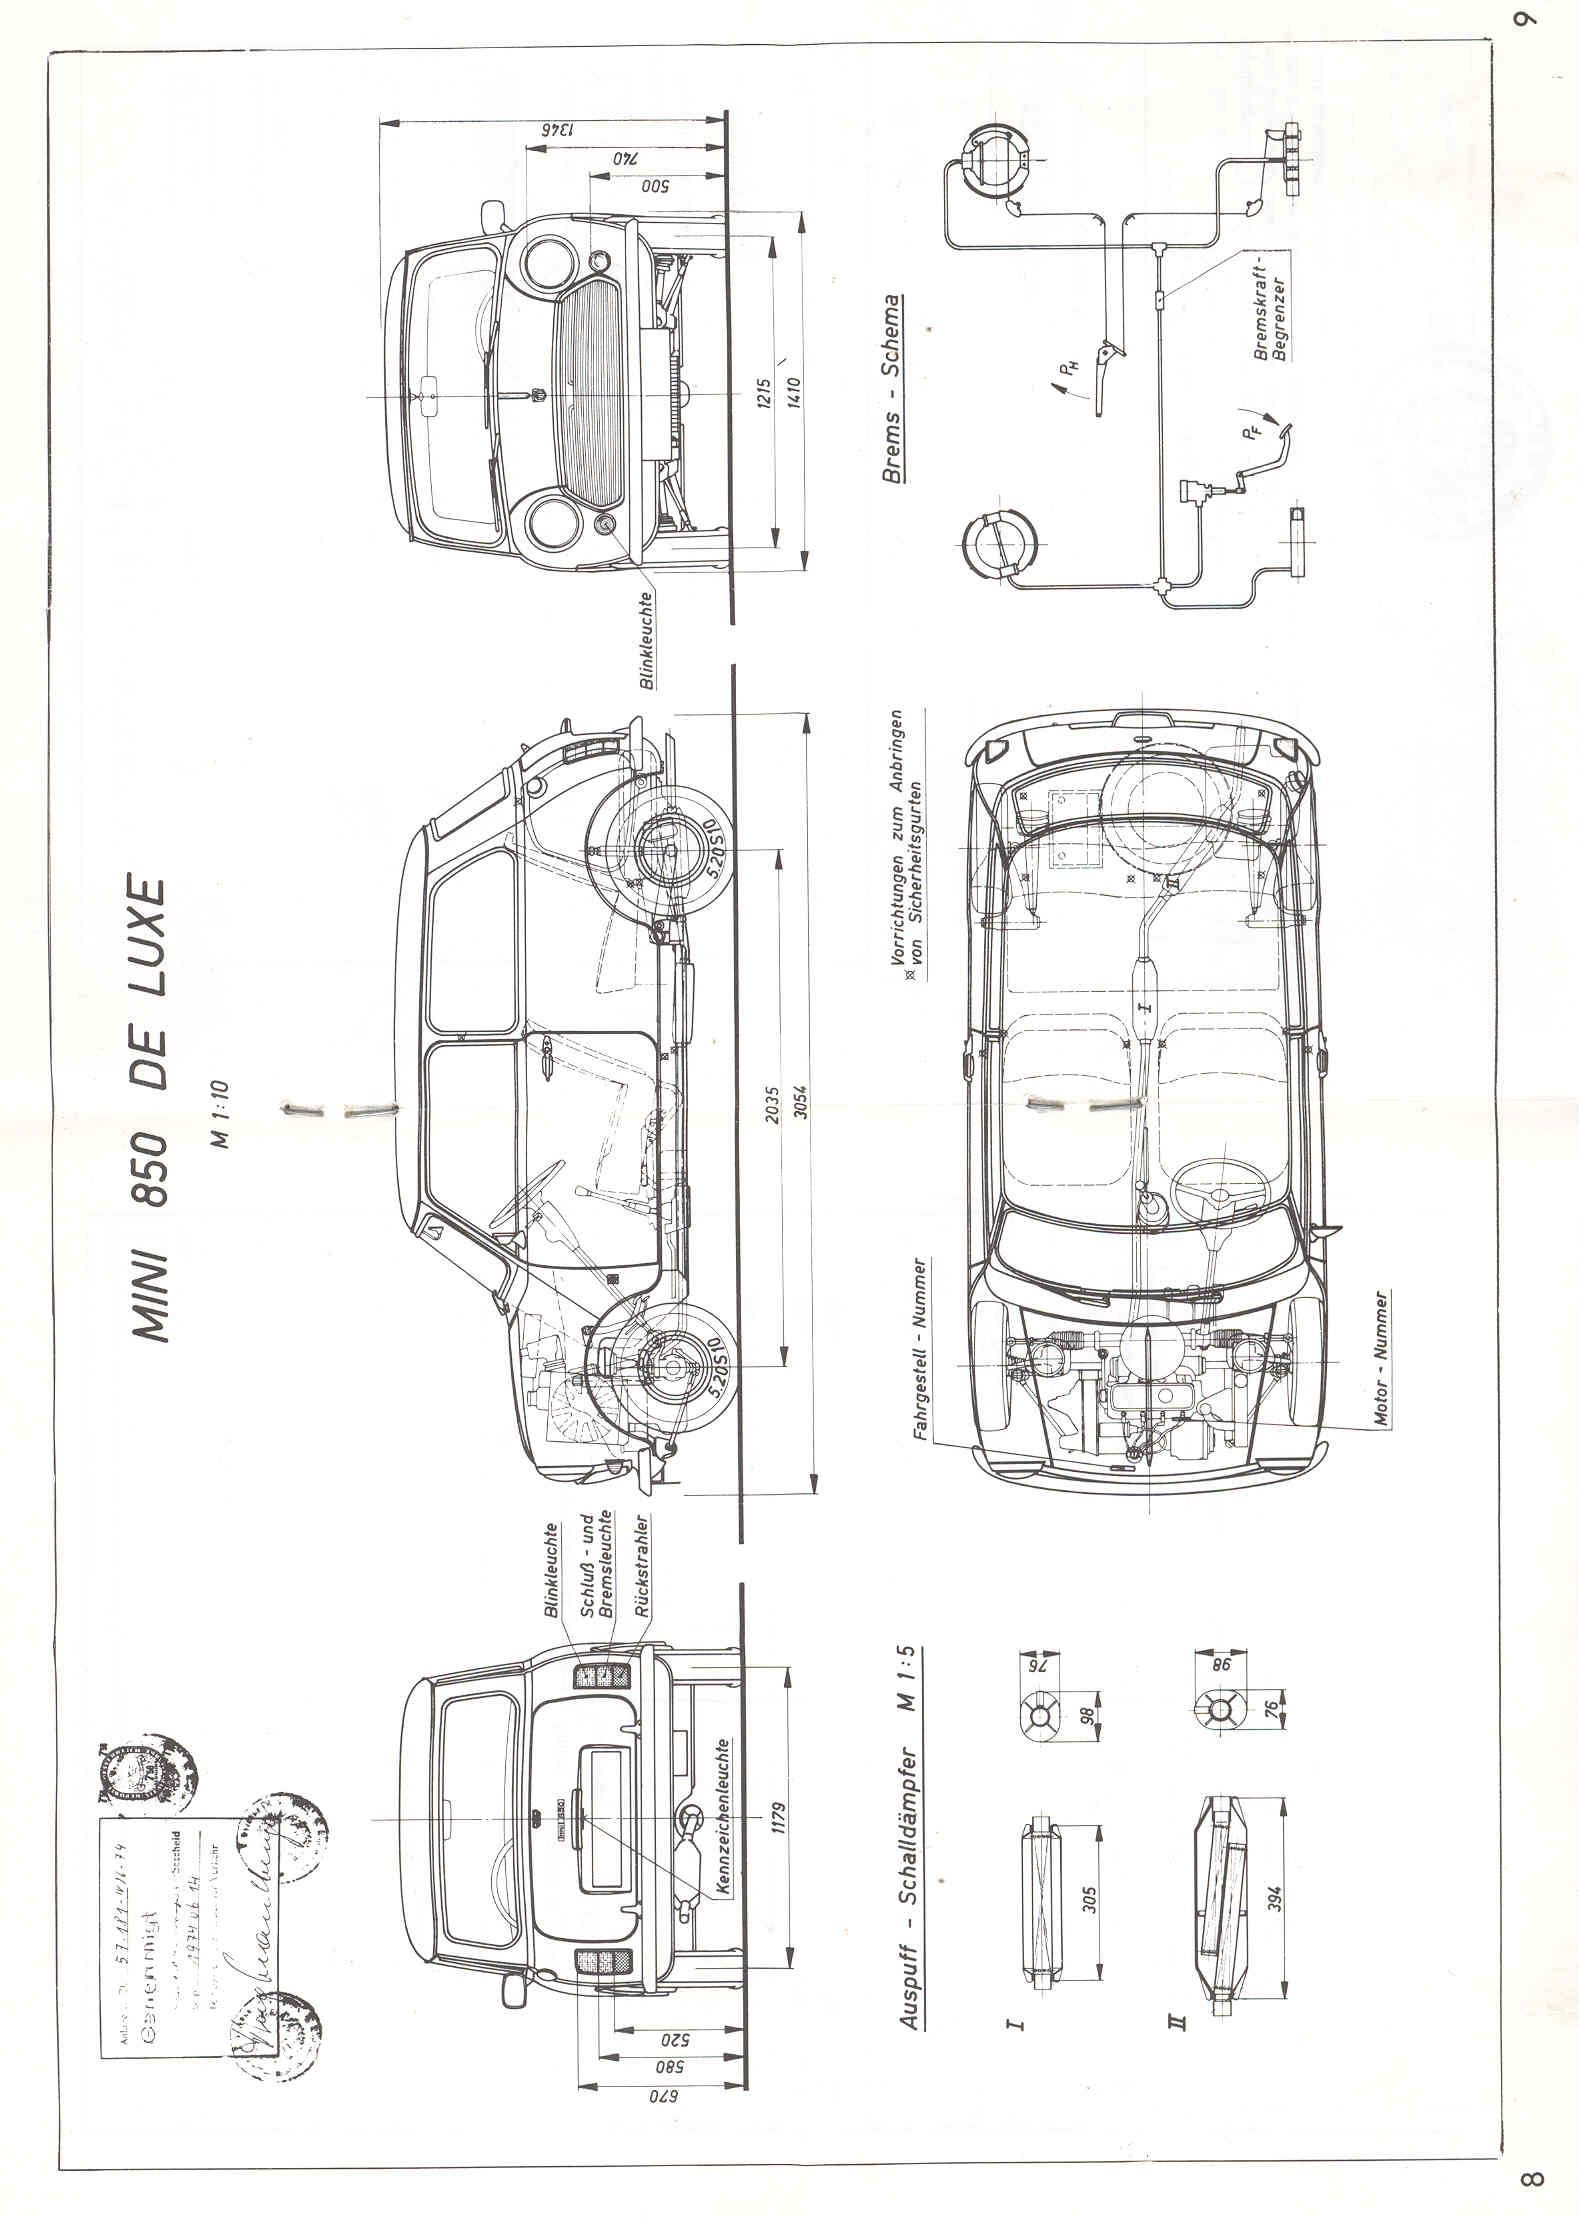 austin-mini-cooper-850-de-luxe-1974-jpg.123535 1 579×2 217